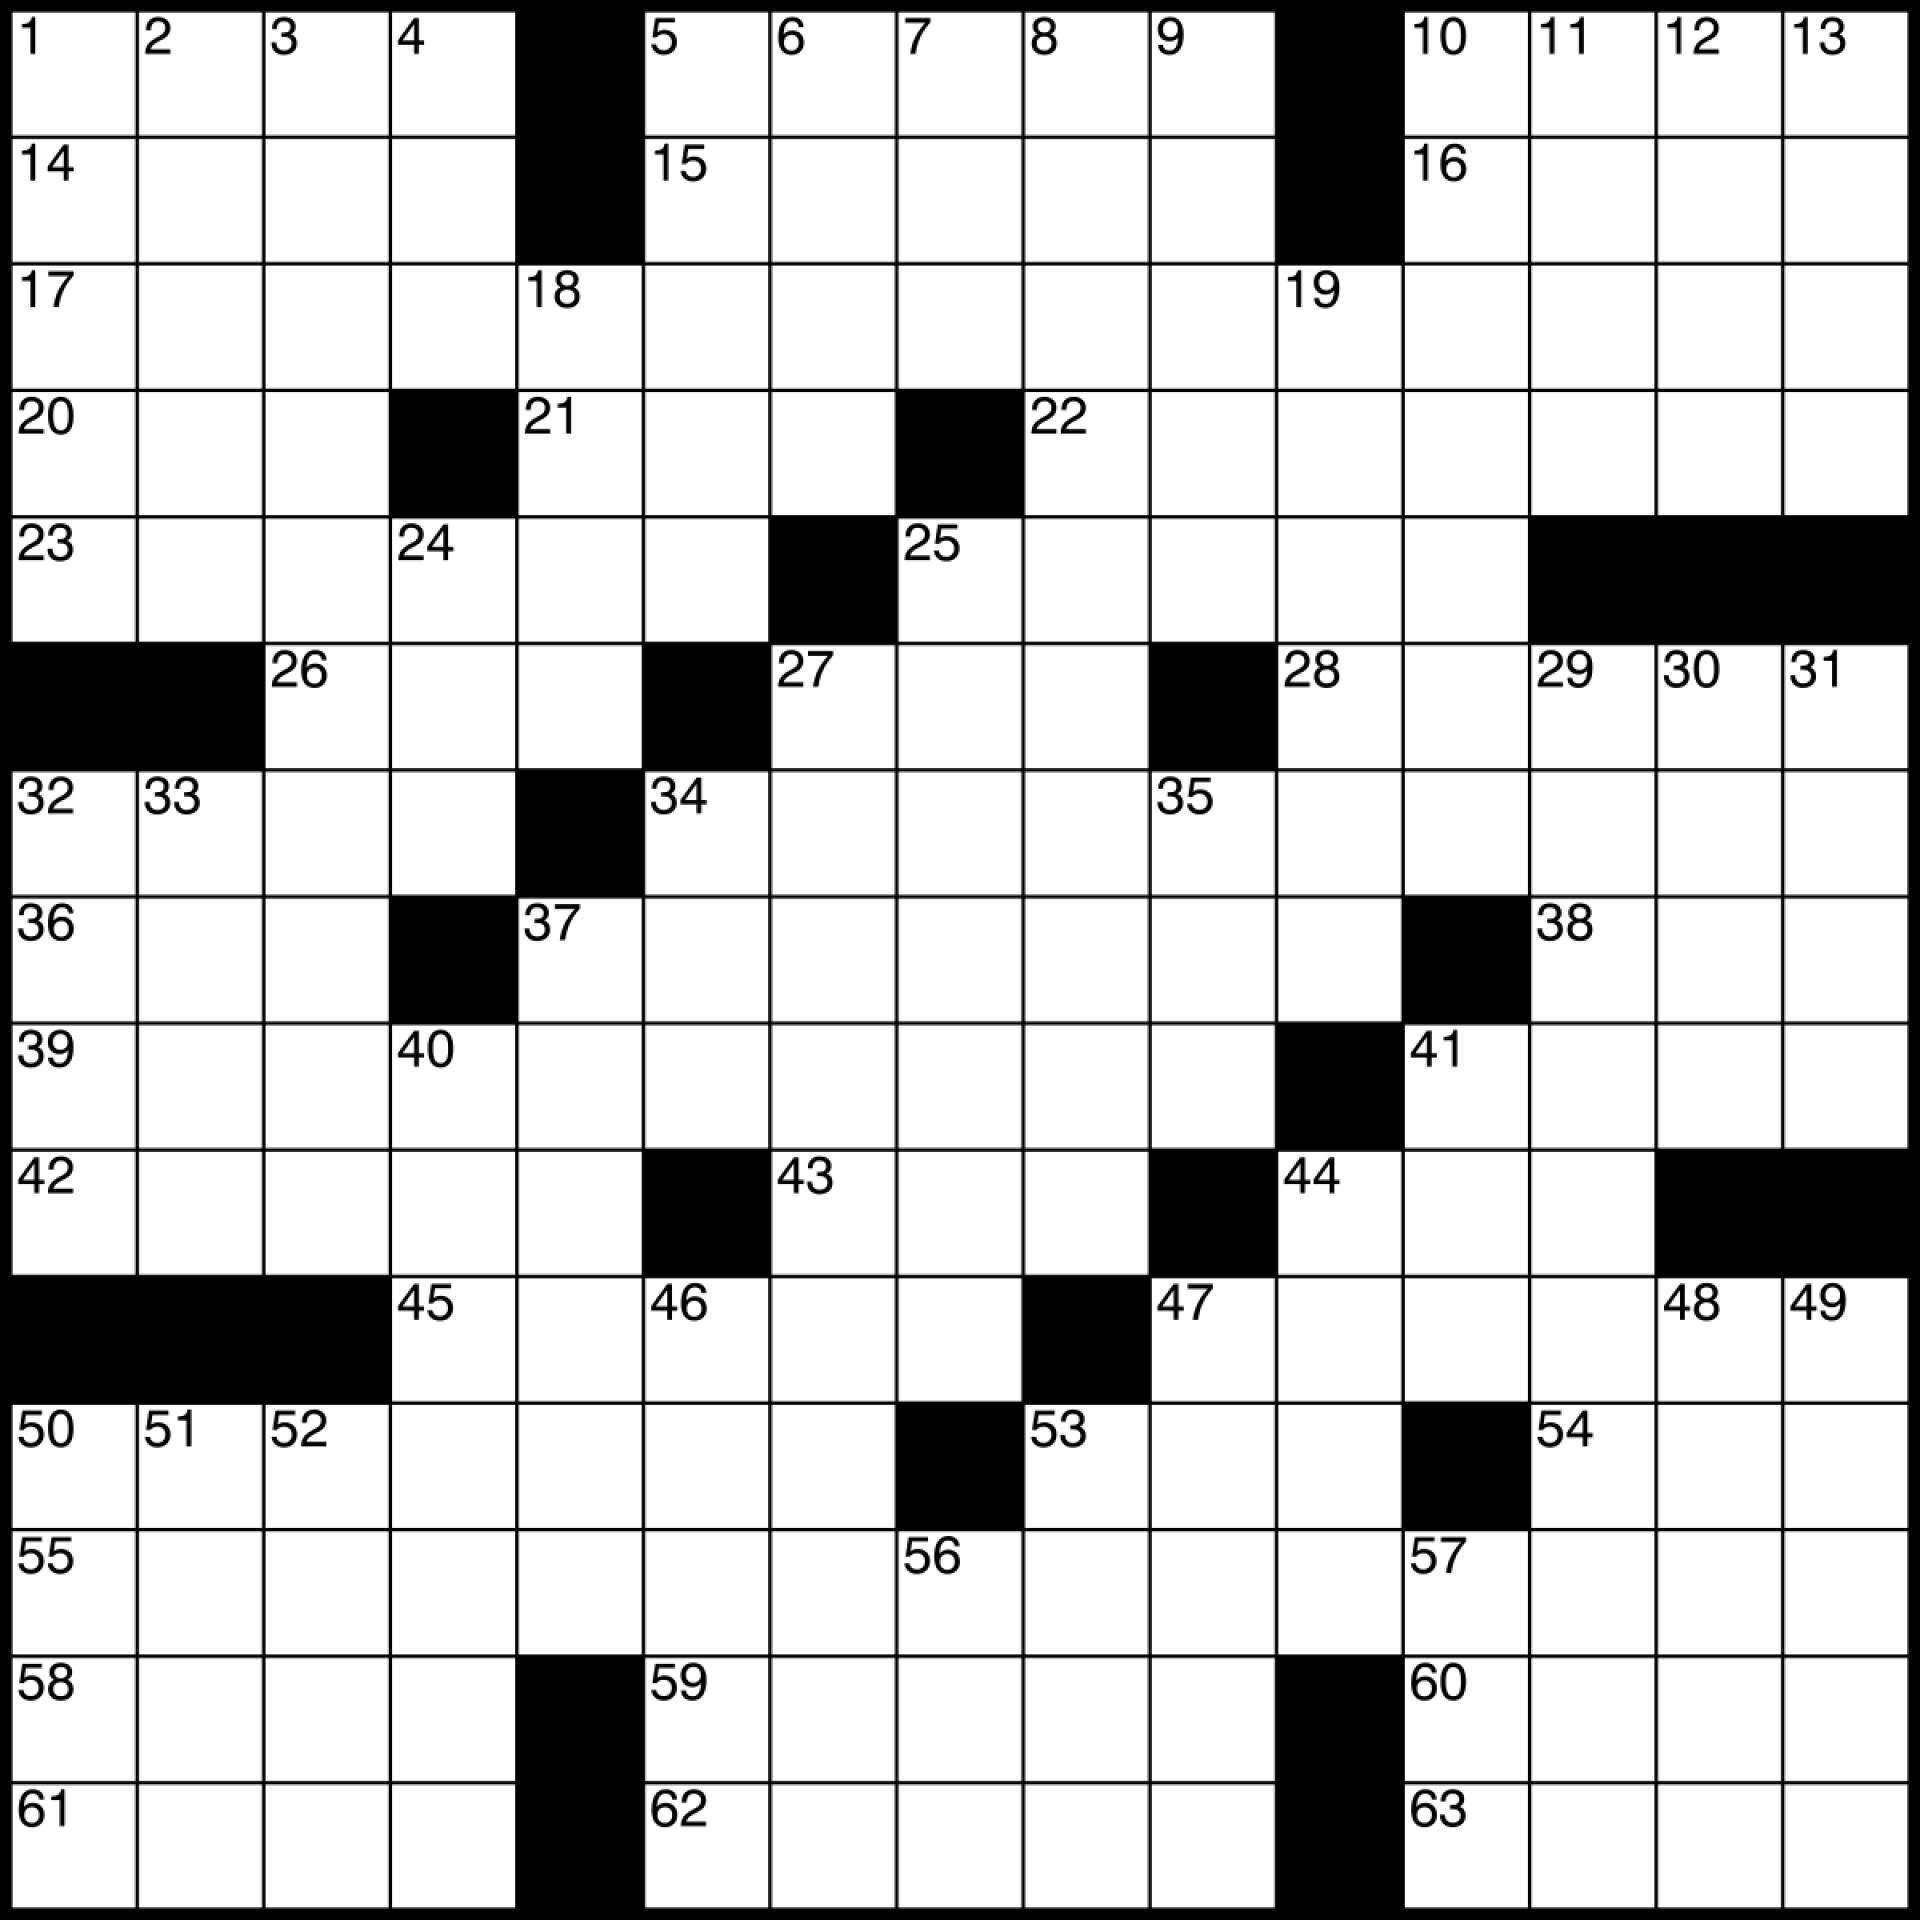 017 Essay Example Name In Essays Crossword Clue 1200px Crosswordusa Excellent 1920